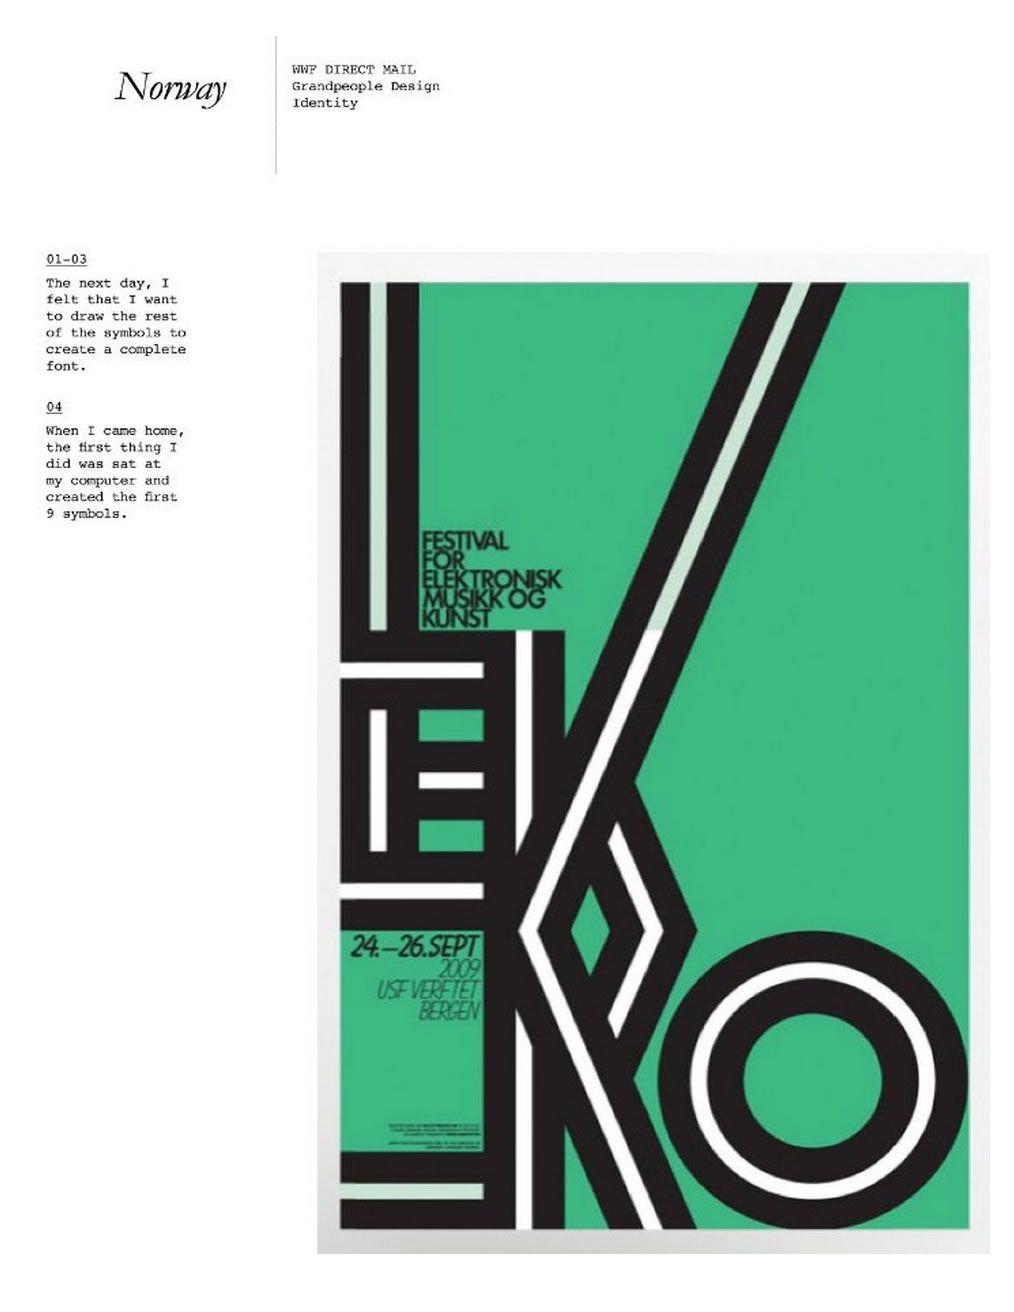 Scandinavian Graphic Design Book Suggestion Abduzeedo Design Inspiration Tutorials Graphic Design Books Book Design Book Suggestions